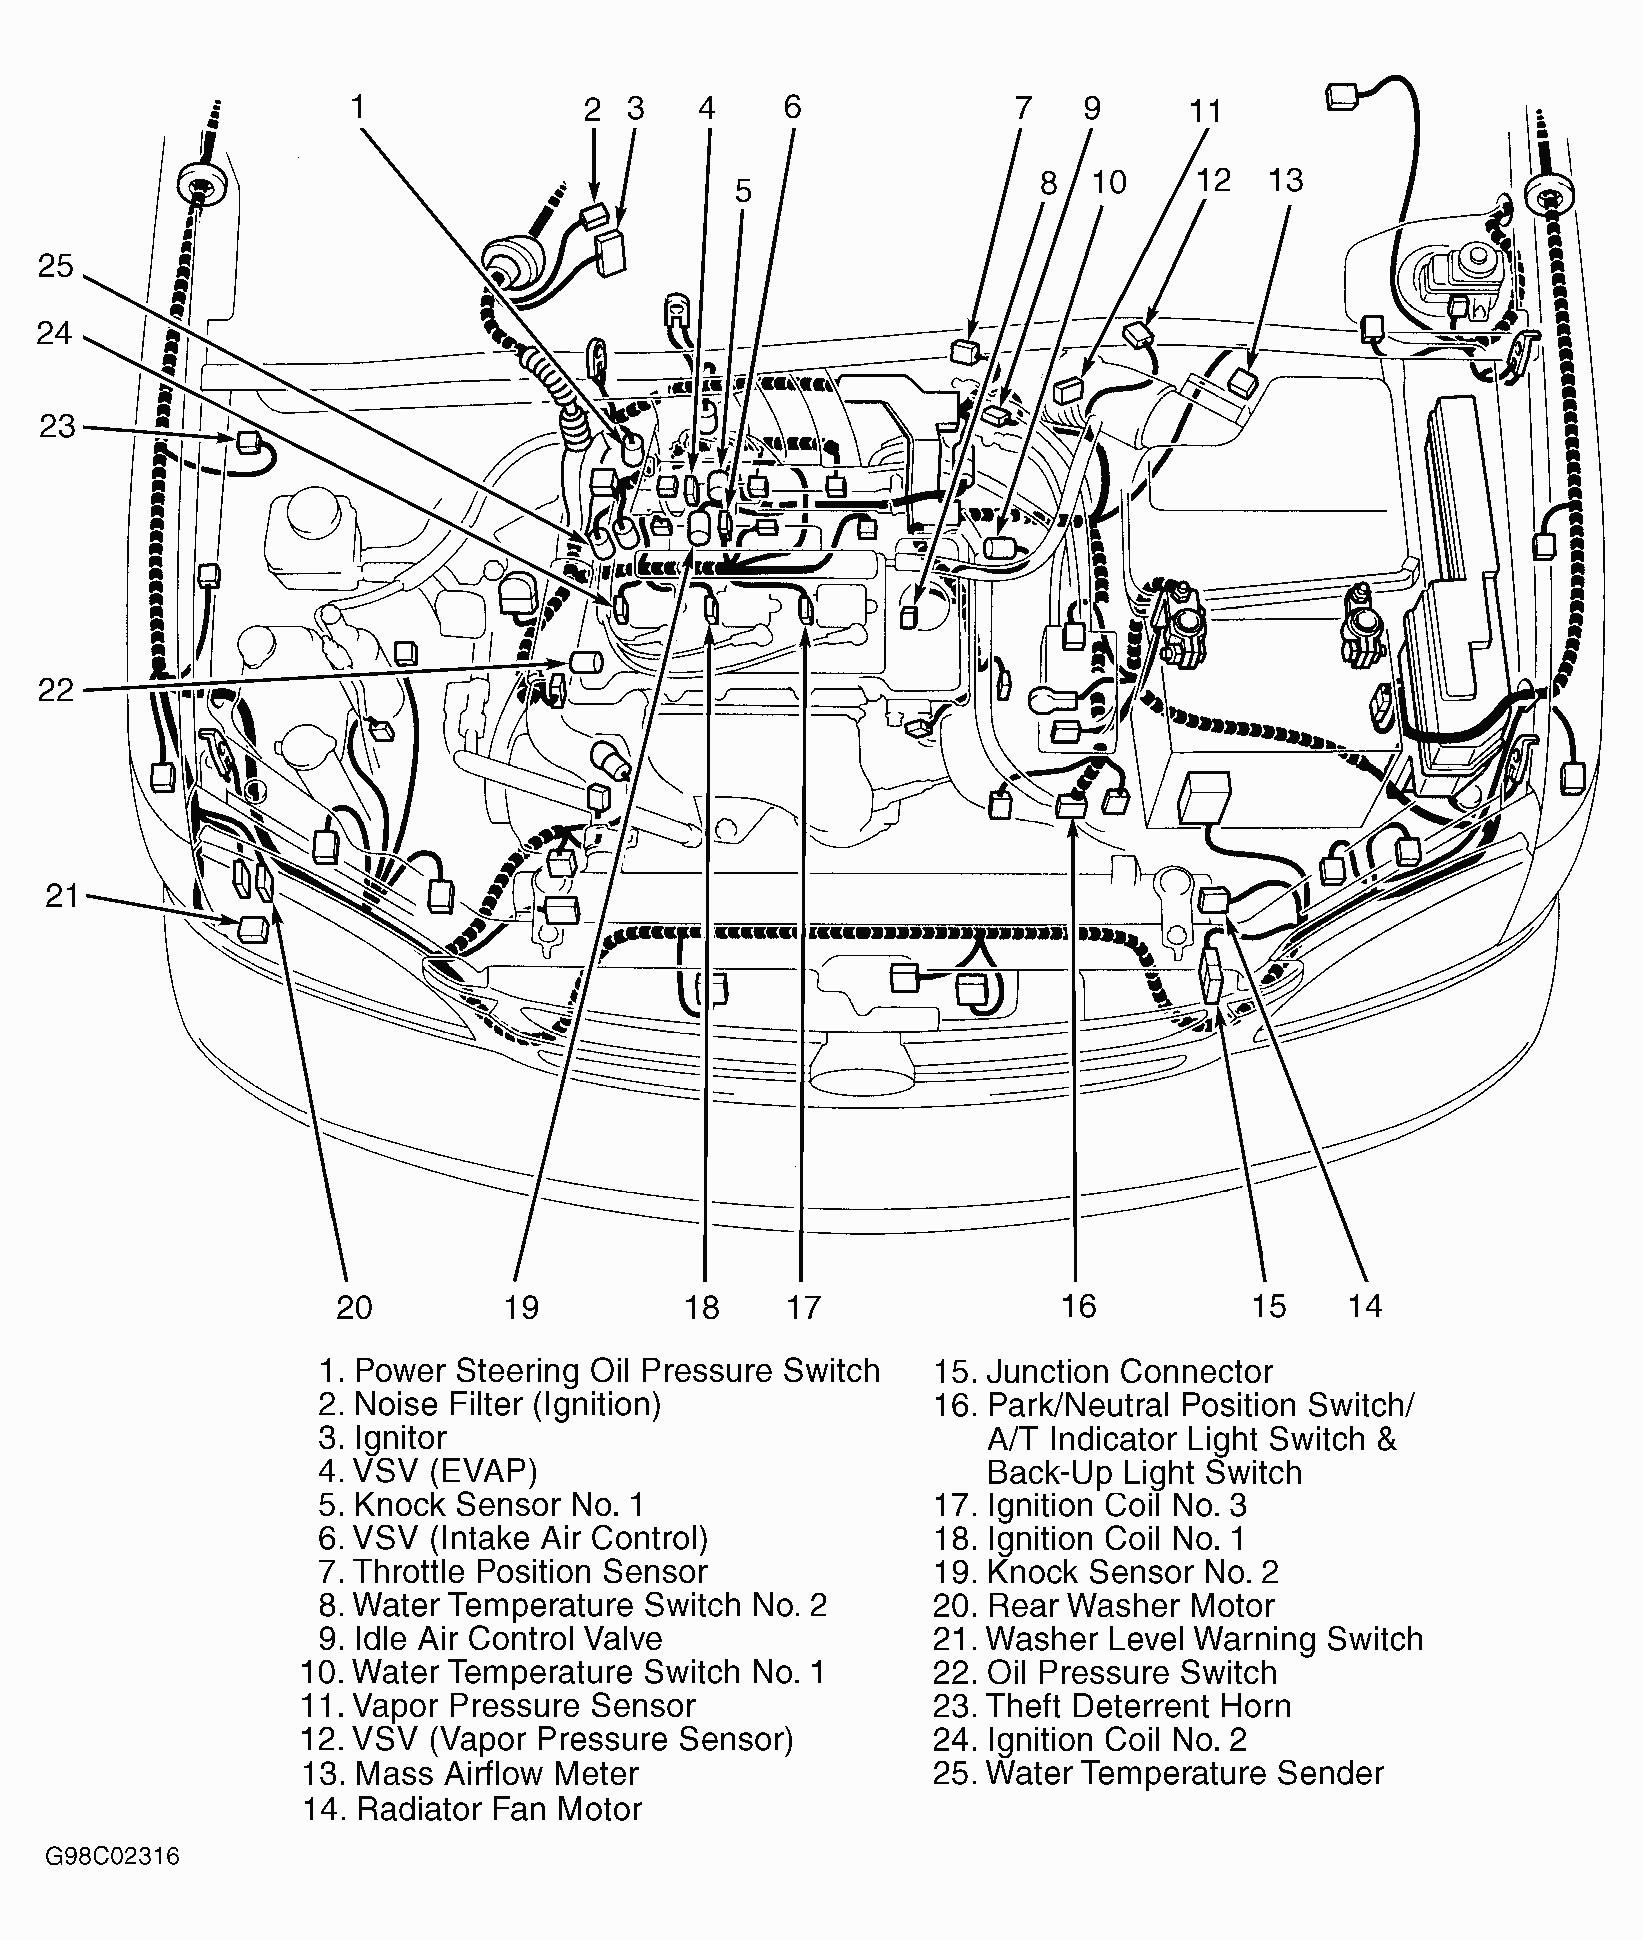 1998 Lexus Es300 Engine Diagram 1995 Lexus Engine Diagram Wiring Diagram Imp Of 1998 Lexus Es300 Engine Diagram